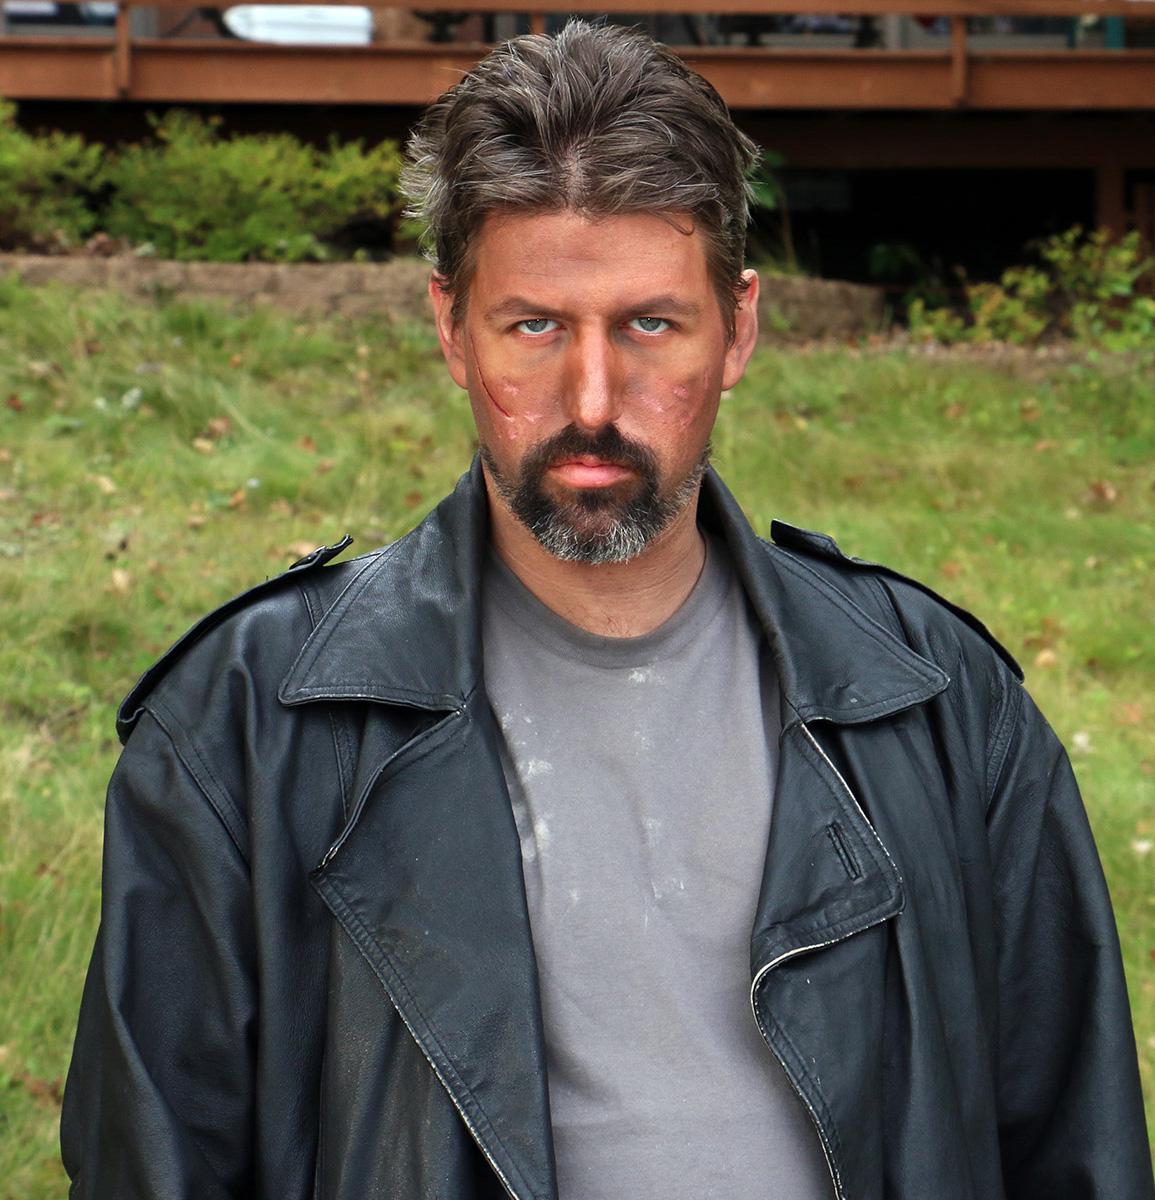 C.J. DeVaan as Bruce in Lake Runs Red